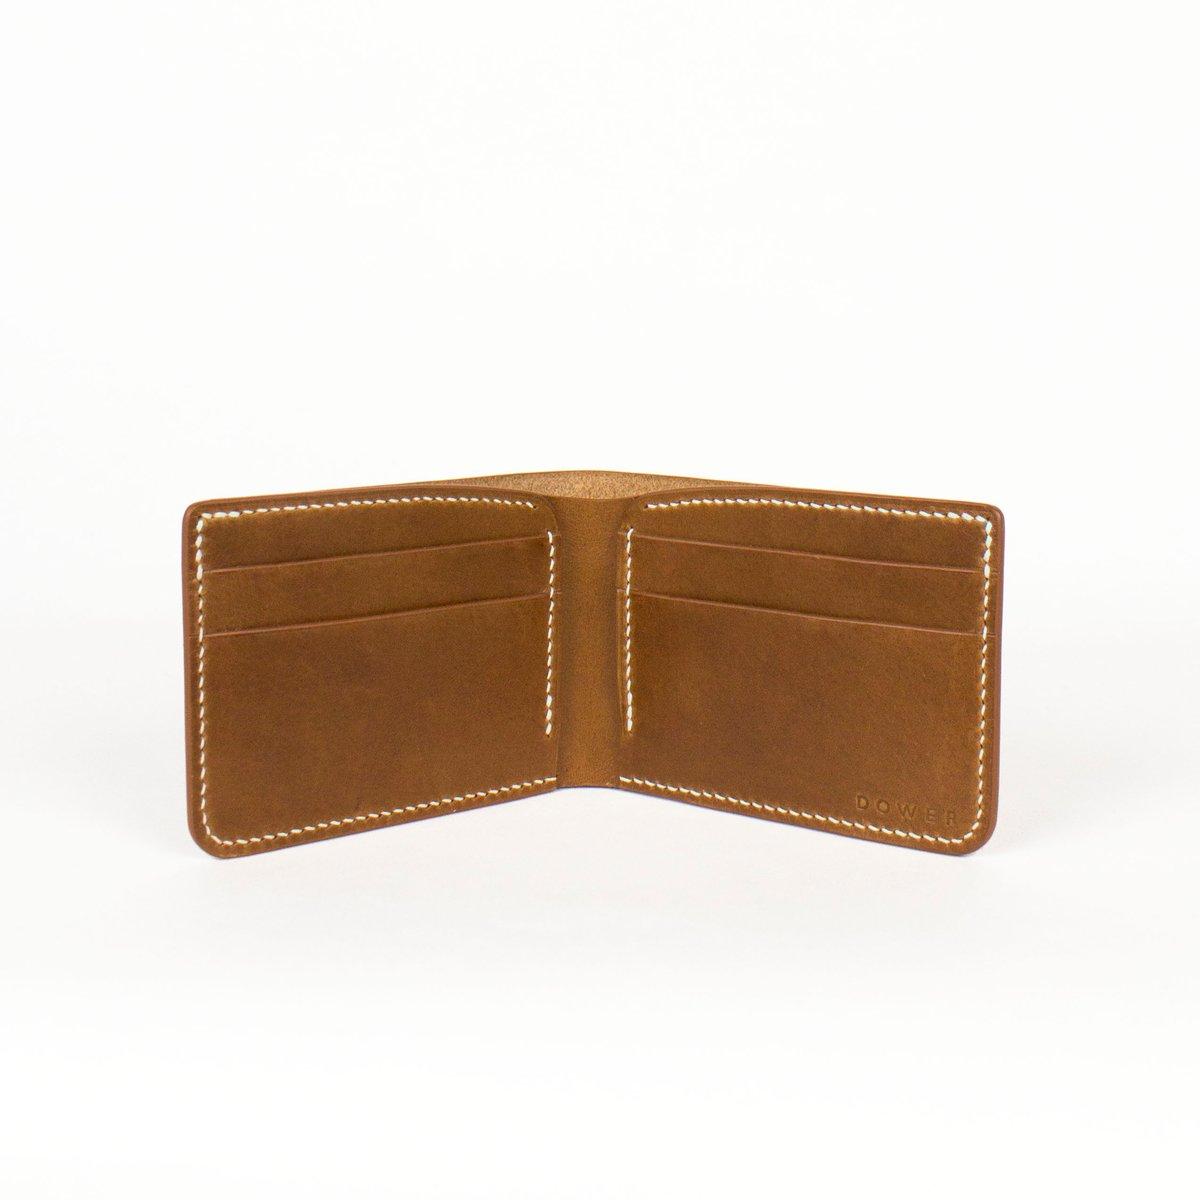 Image of Bifold Wallet